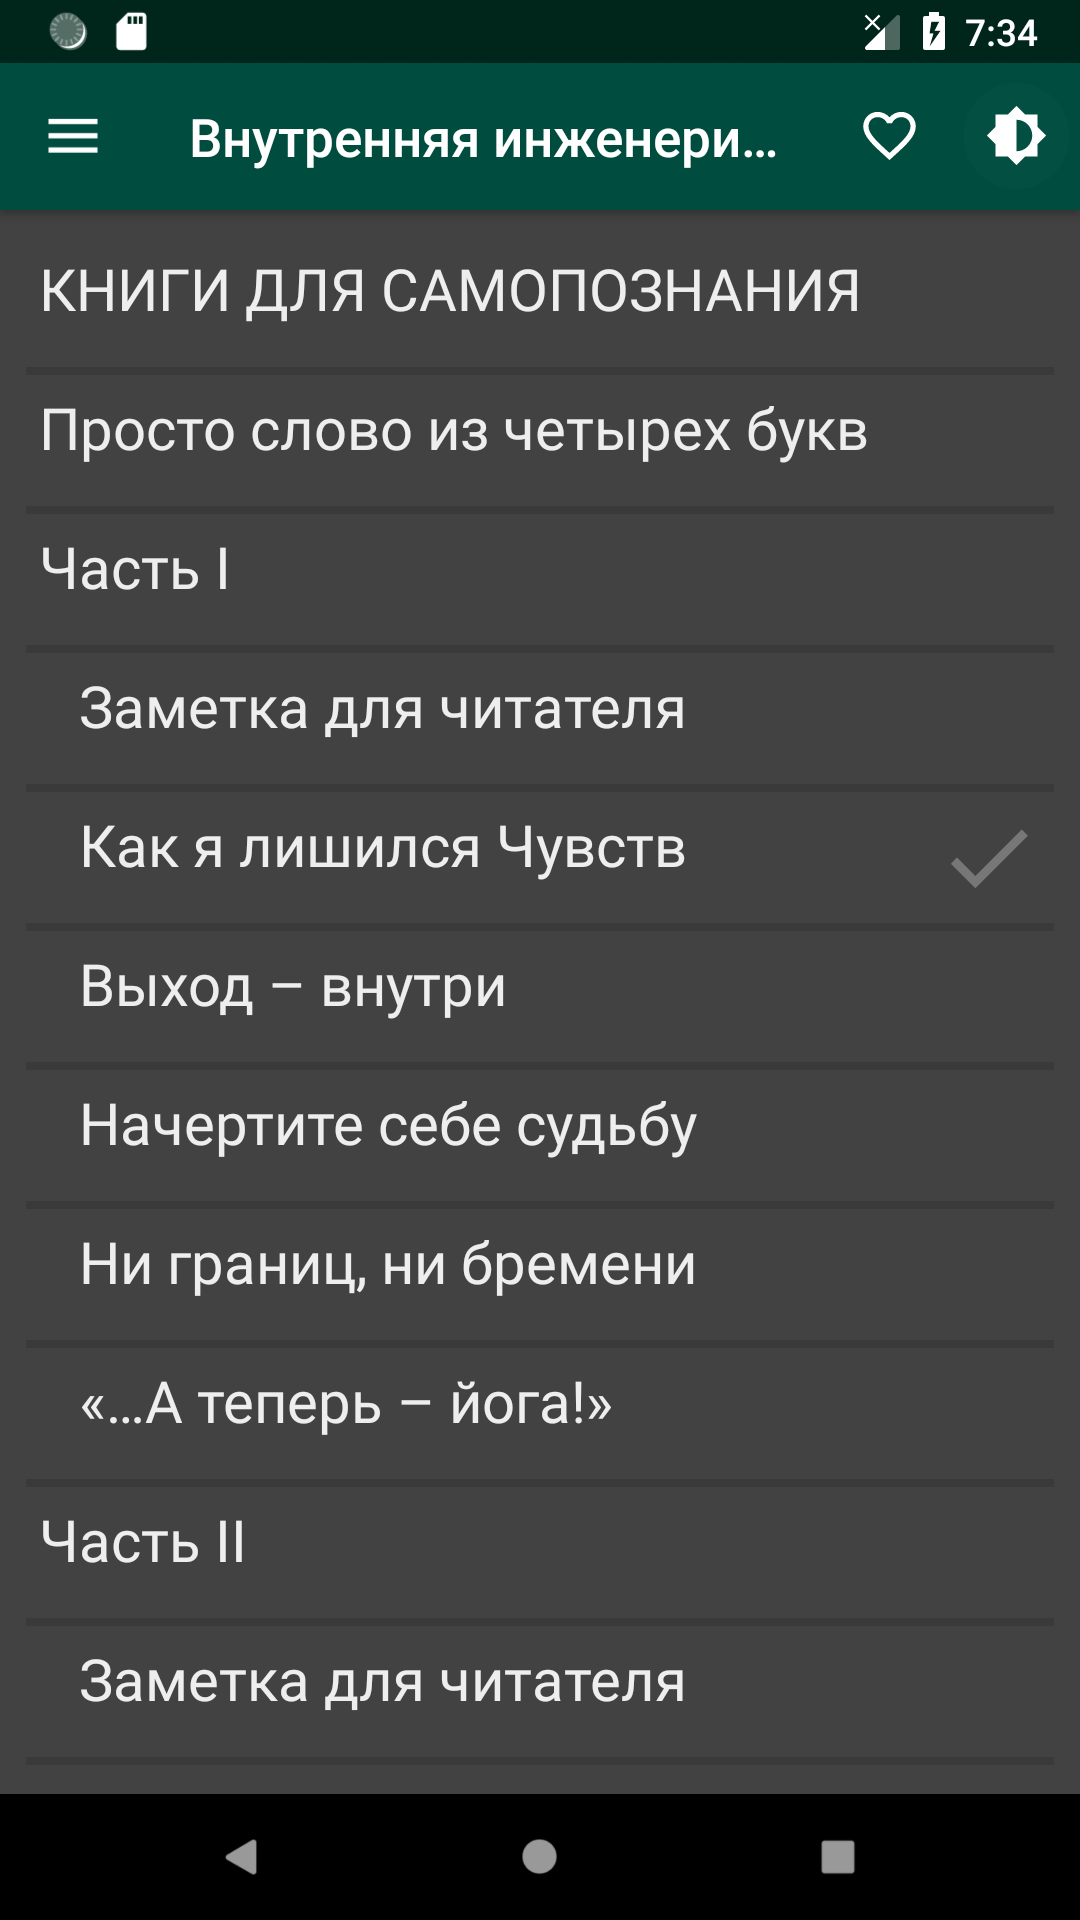 afrd apk на русском